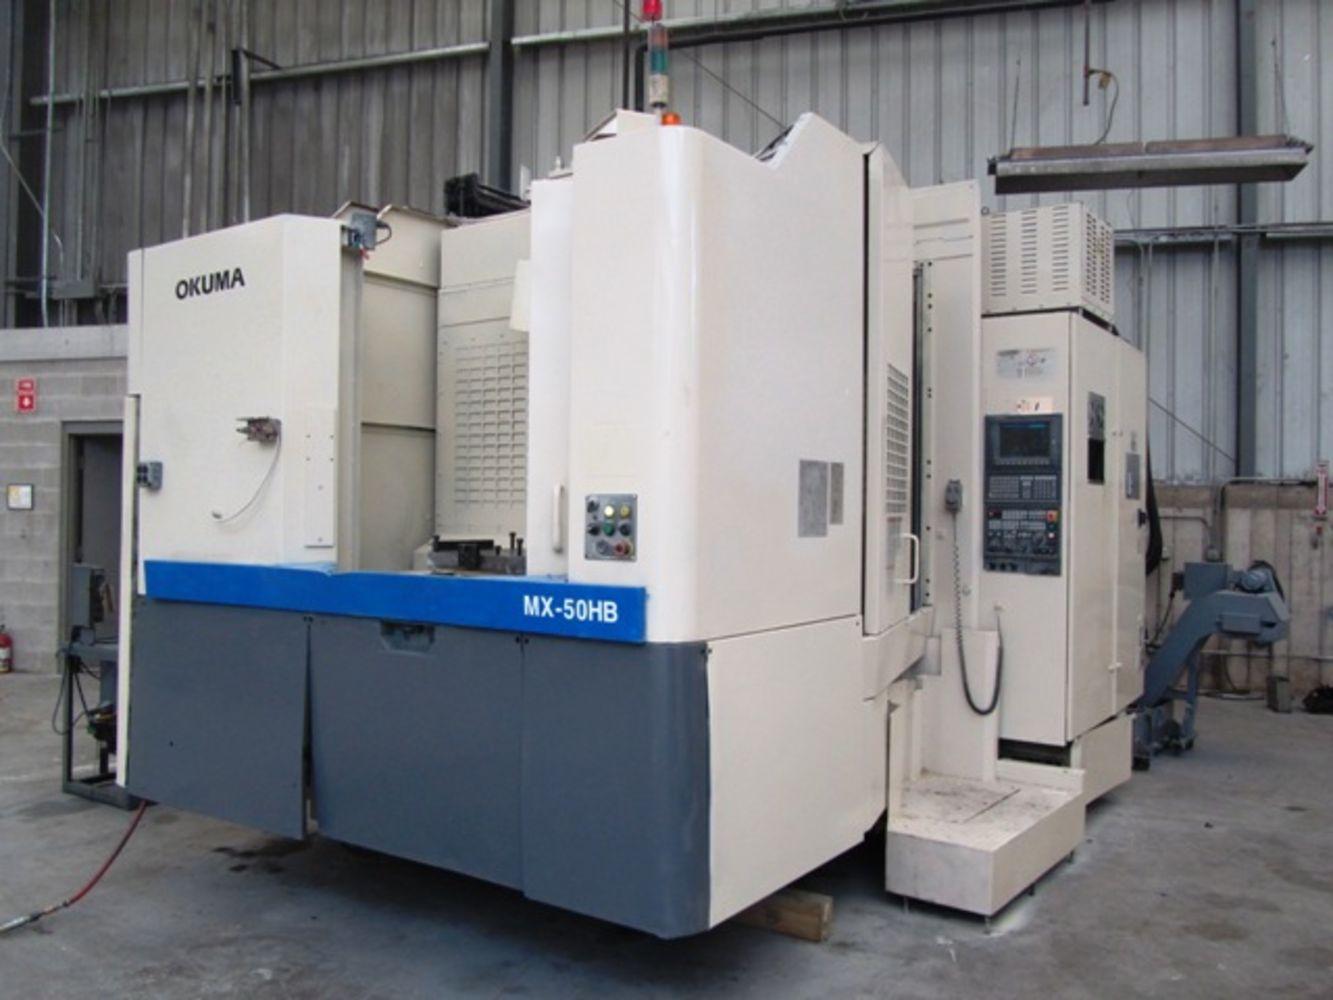 METALX - Okuma & Toyoda CNC Horizontal Machining Centers